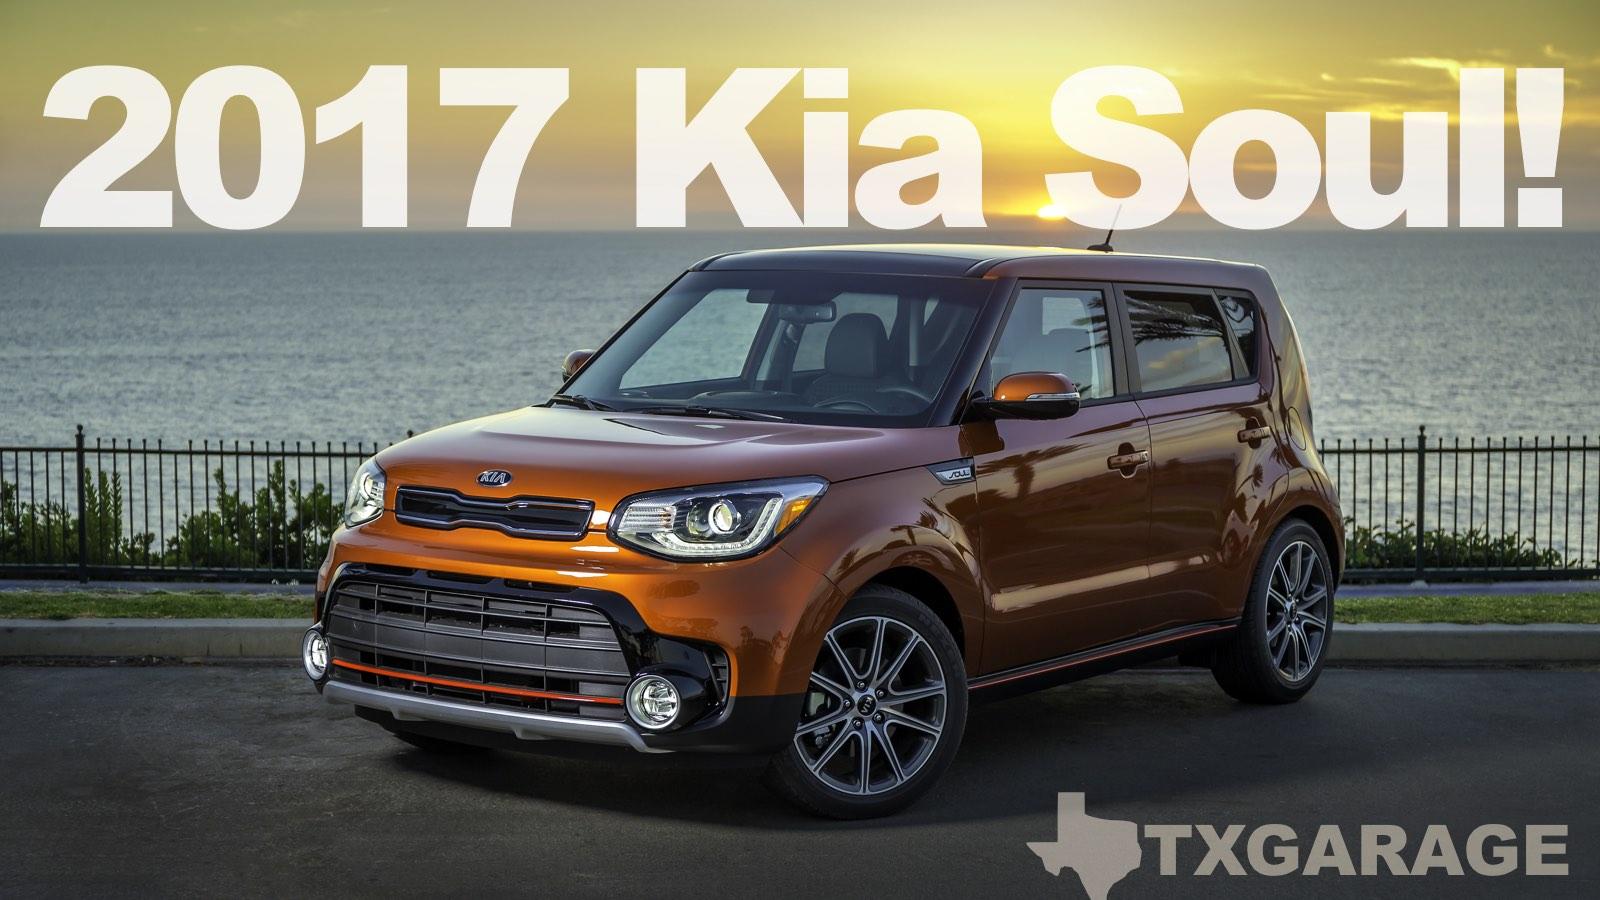 2017-kia-soul-turbo-cover